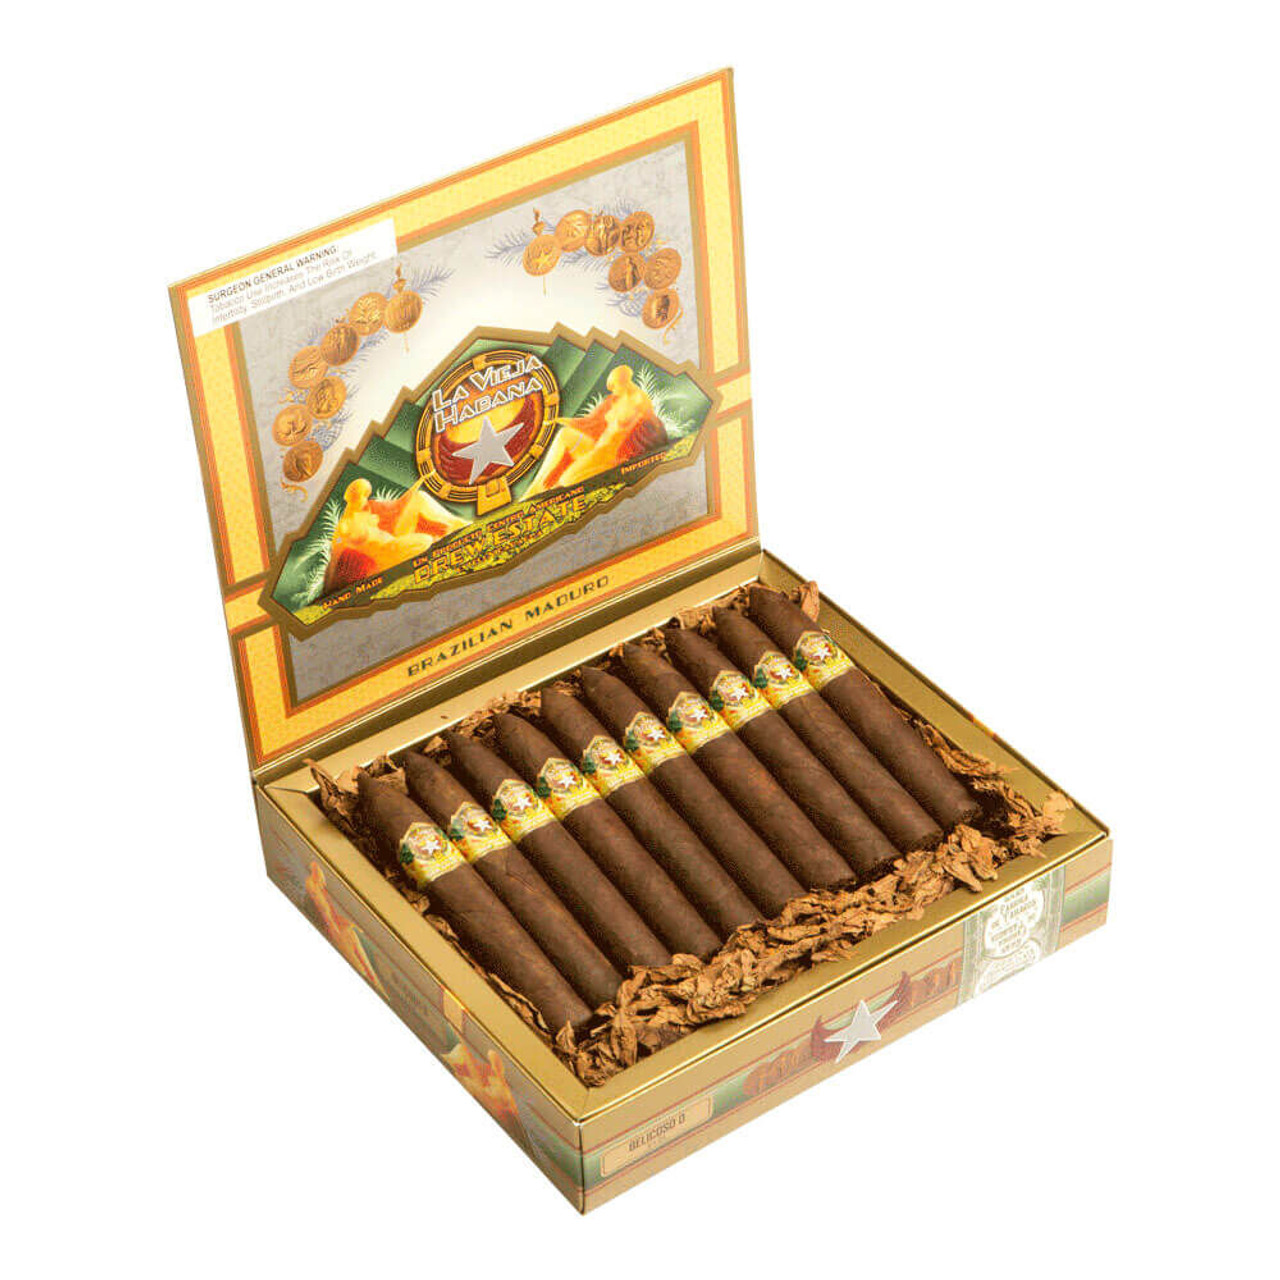 LH Premium Rothschild Luxo Cigars - 5 x 54 (Box of 20)